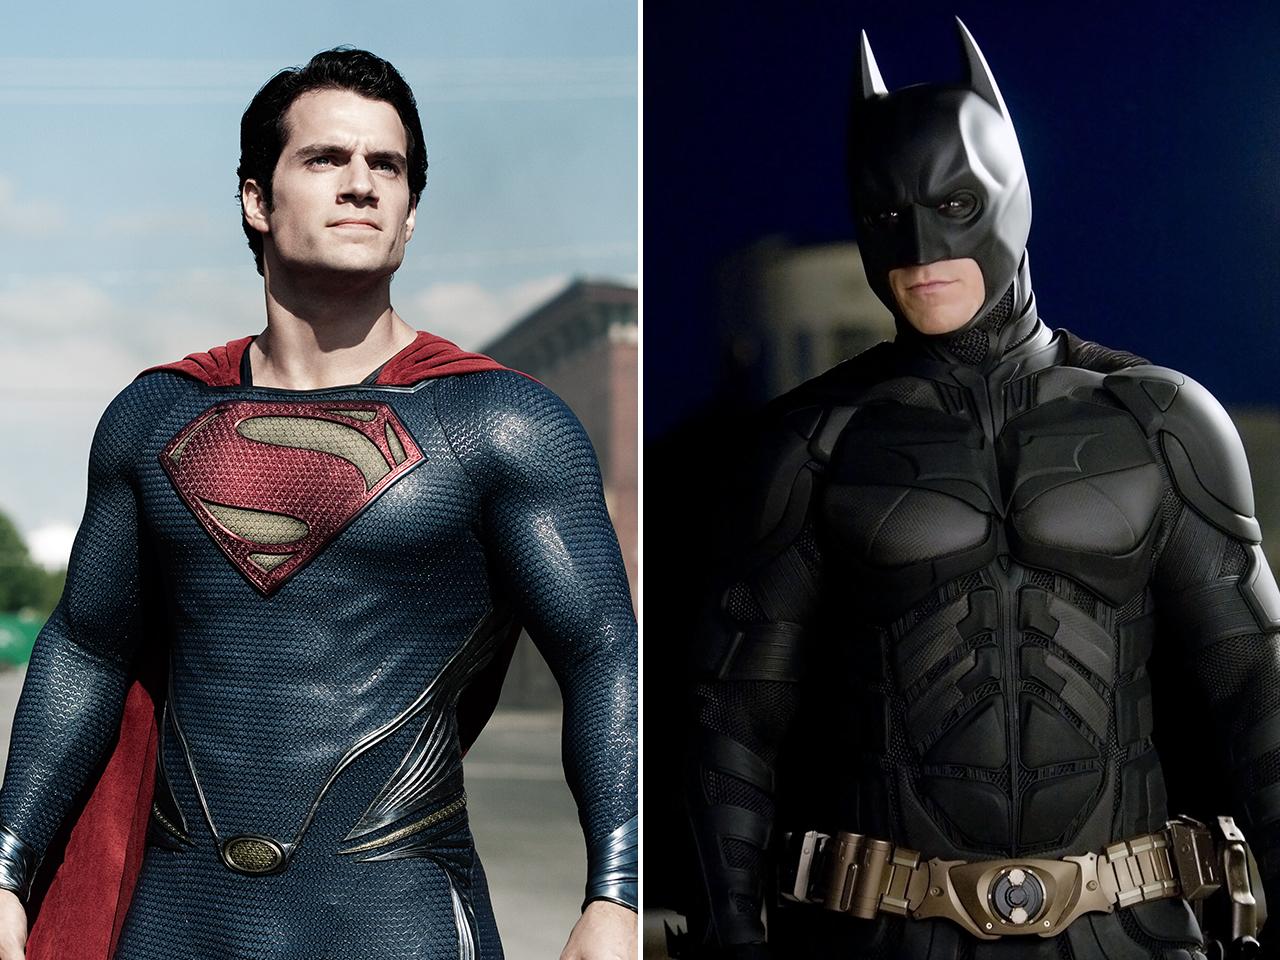 IMAGE: Superman, Batman